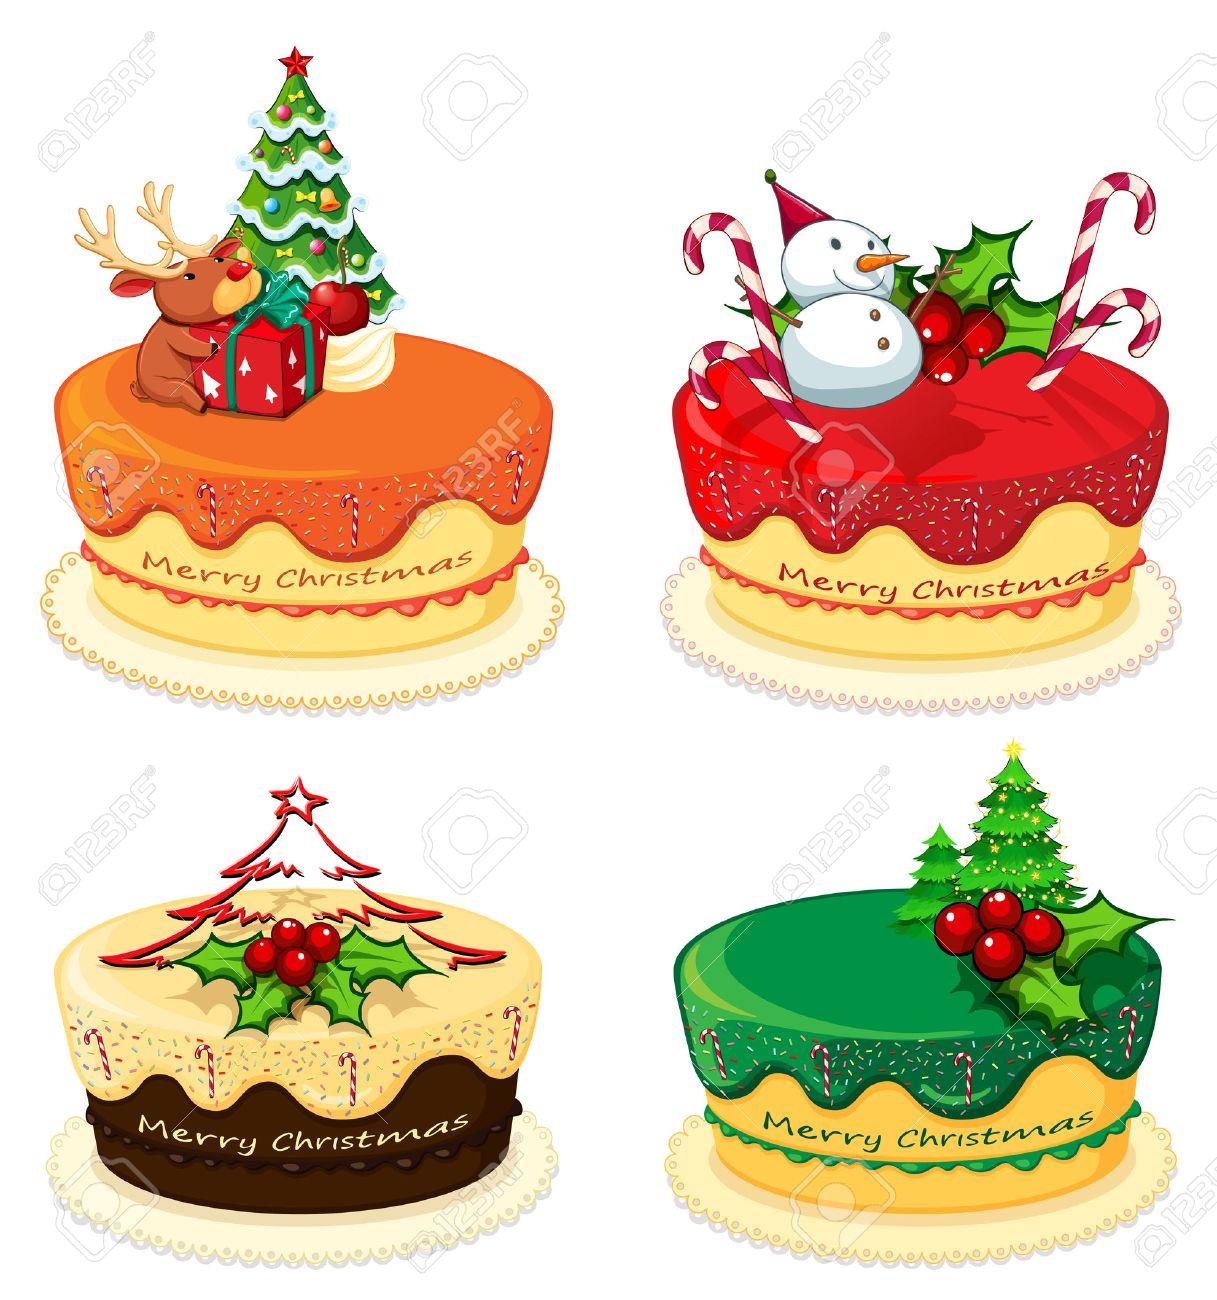 designs for christmas